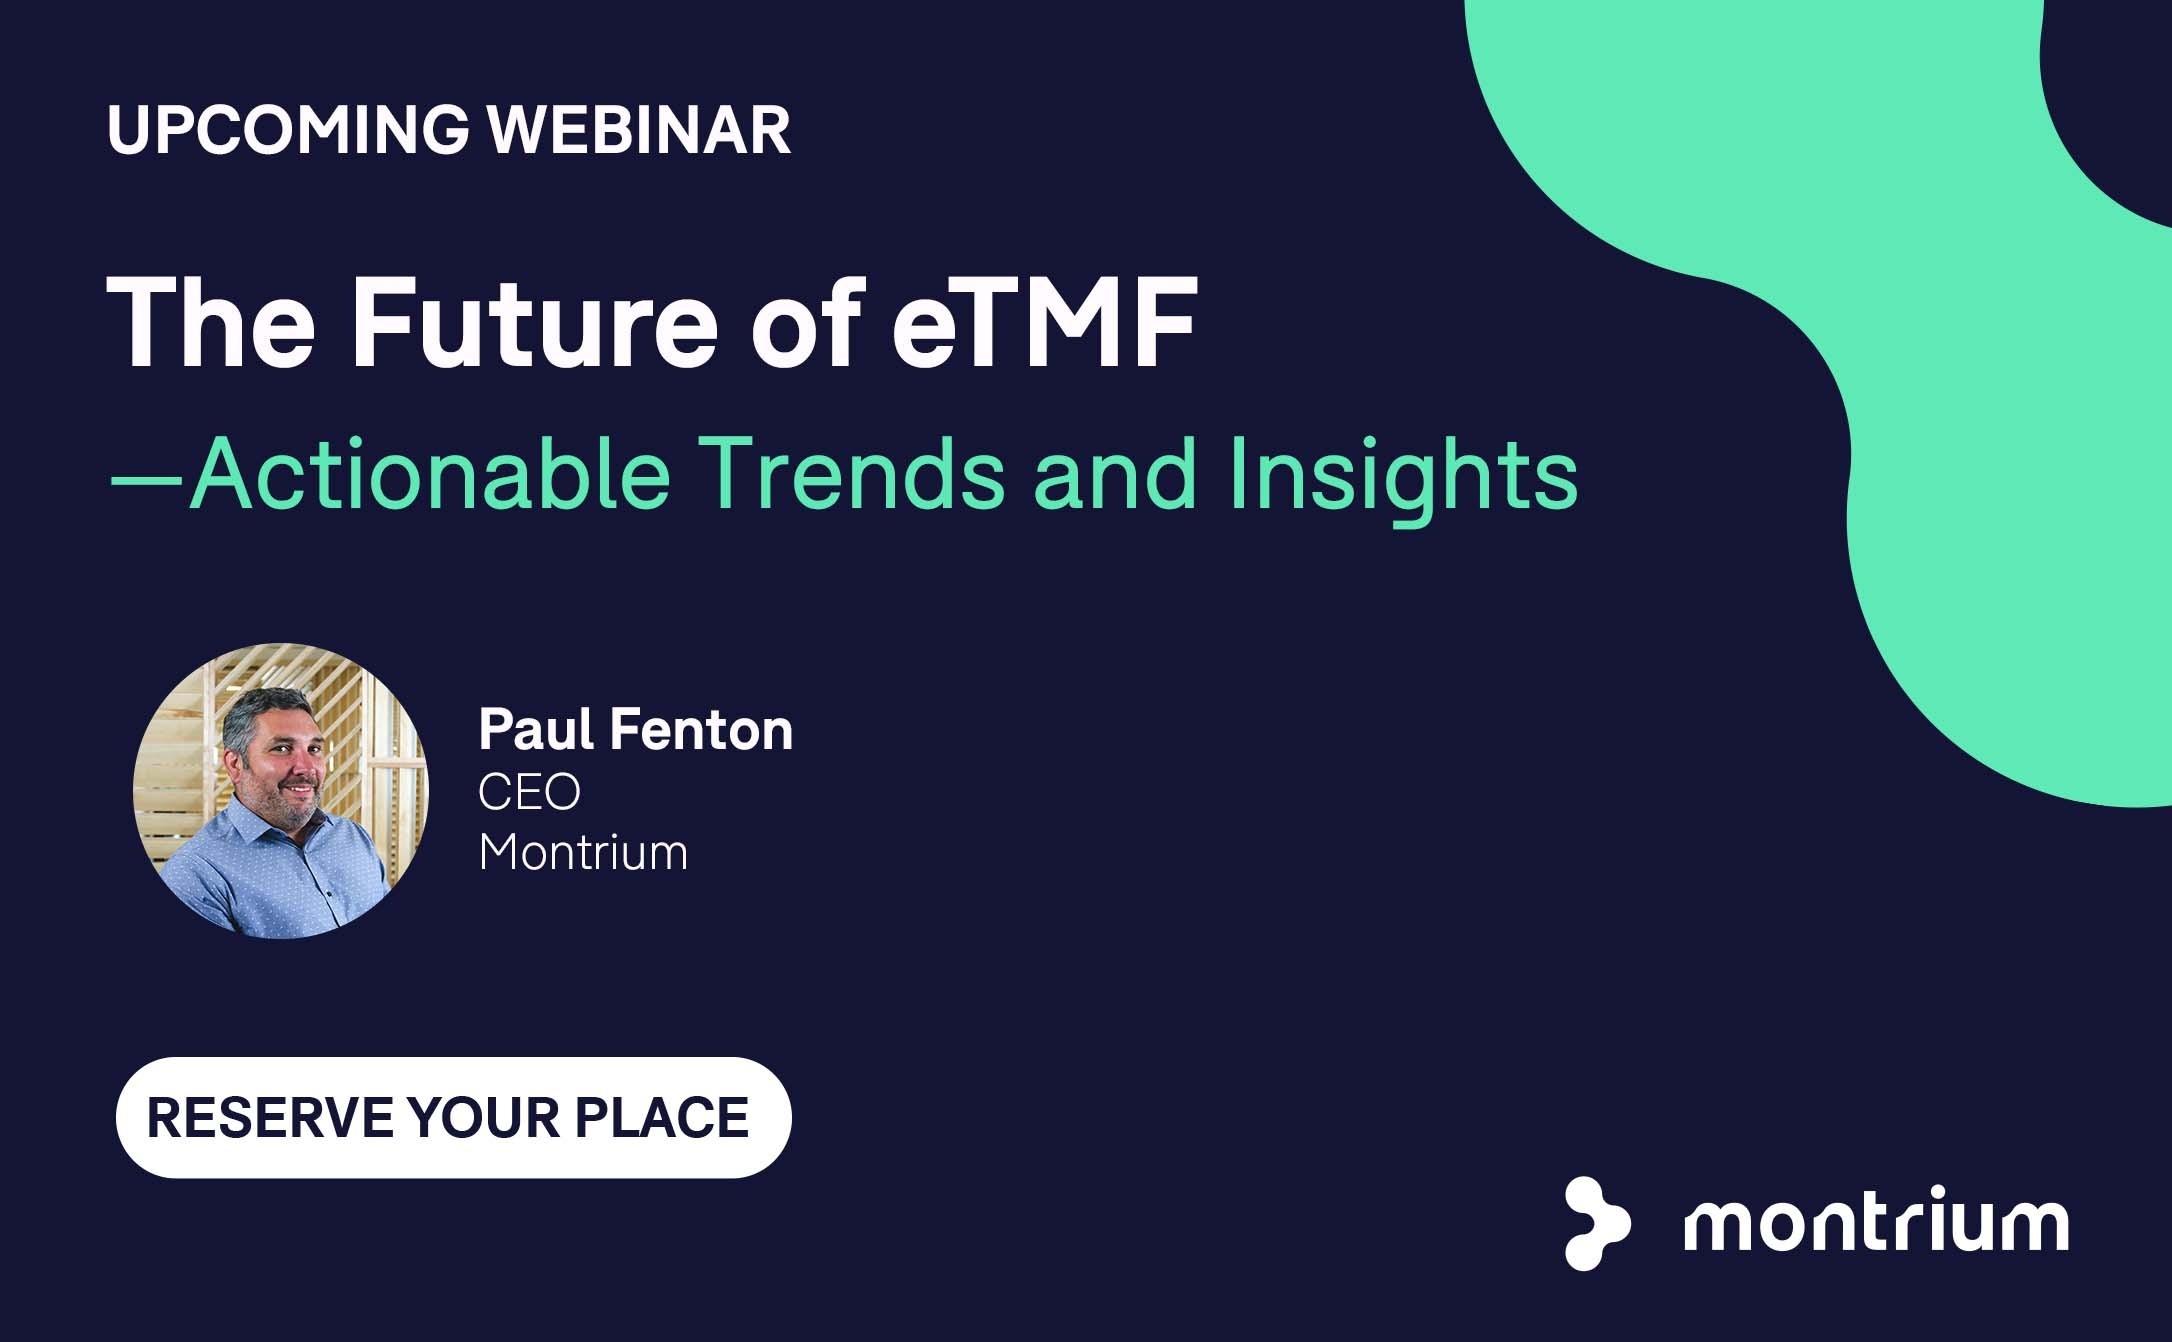 Future of eTMF